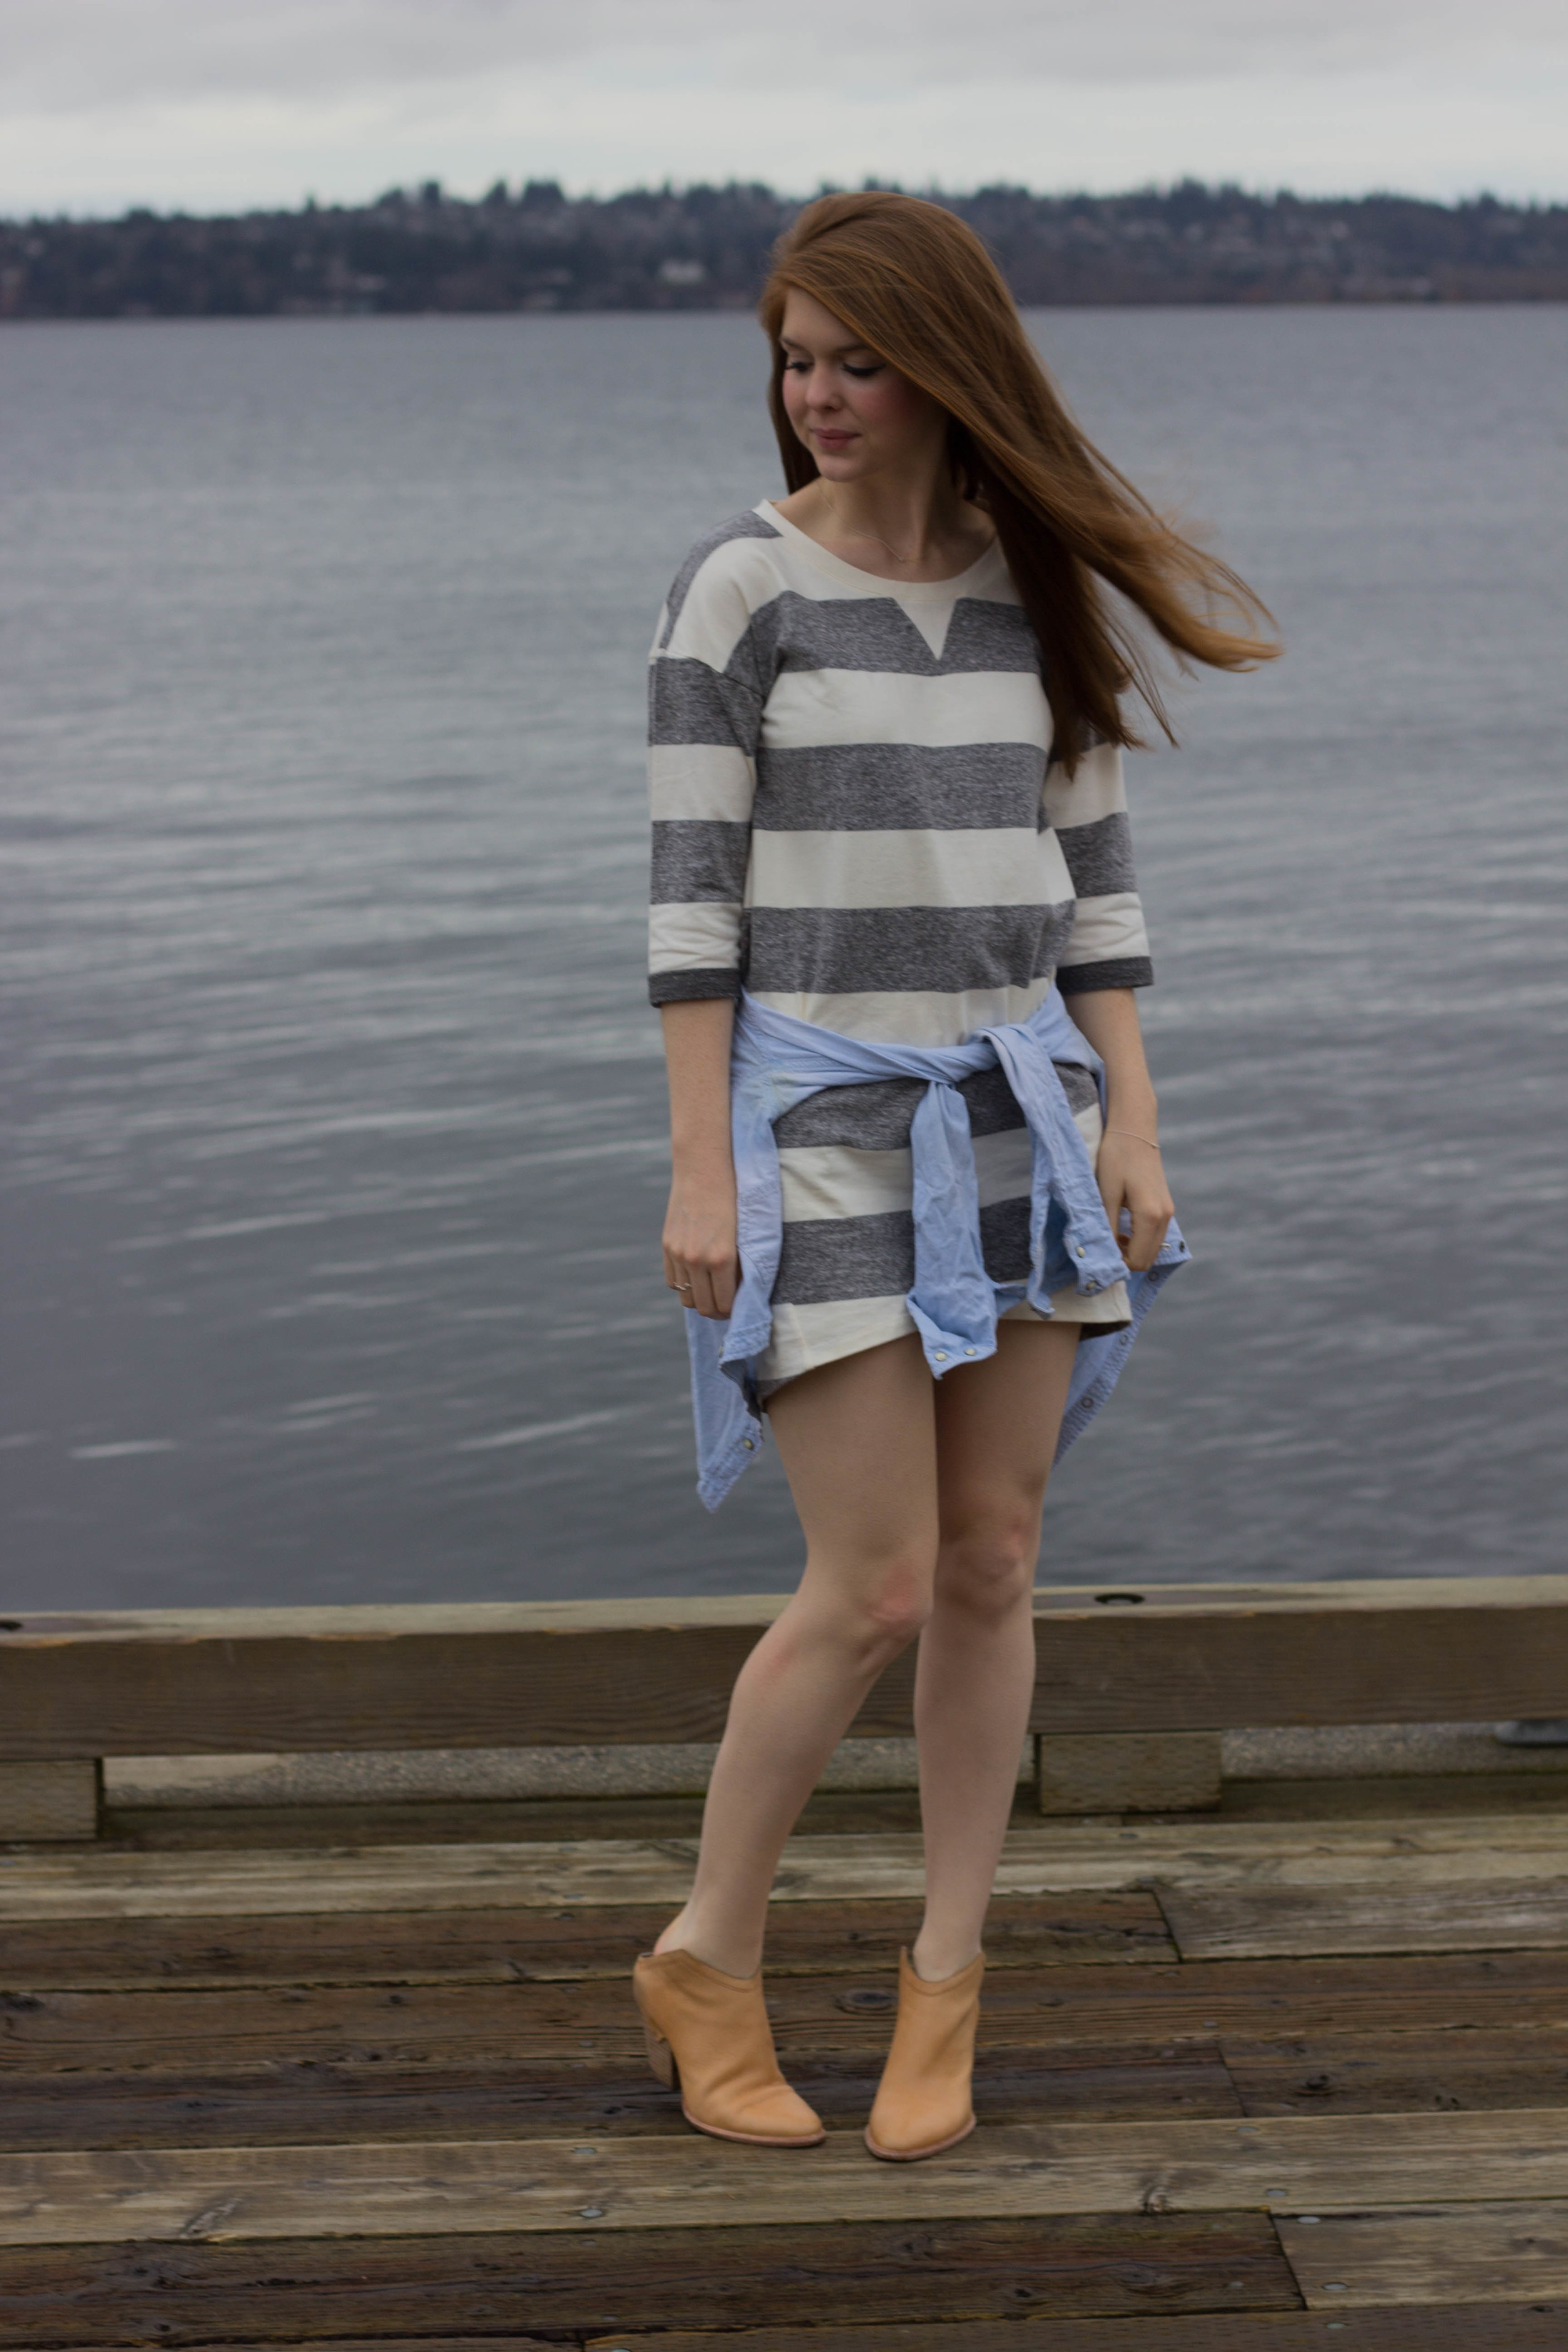 the woodmark hotel, seattle, washington, lake washington, haku booties, chambray top, ellison striped dress, the cutest hotel on lake washington